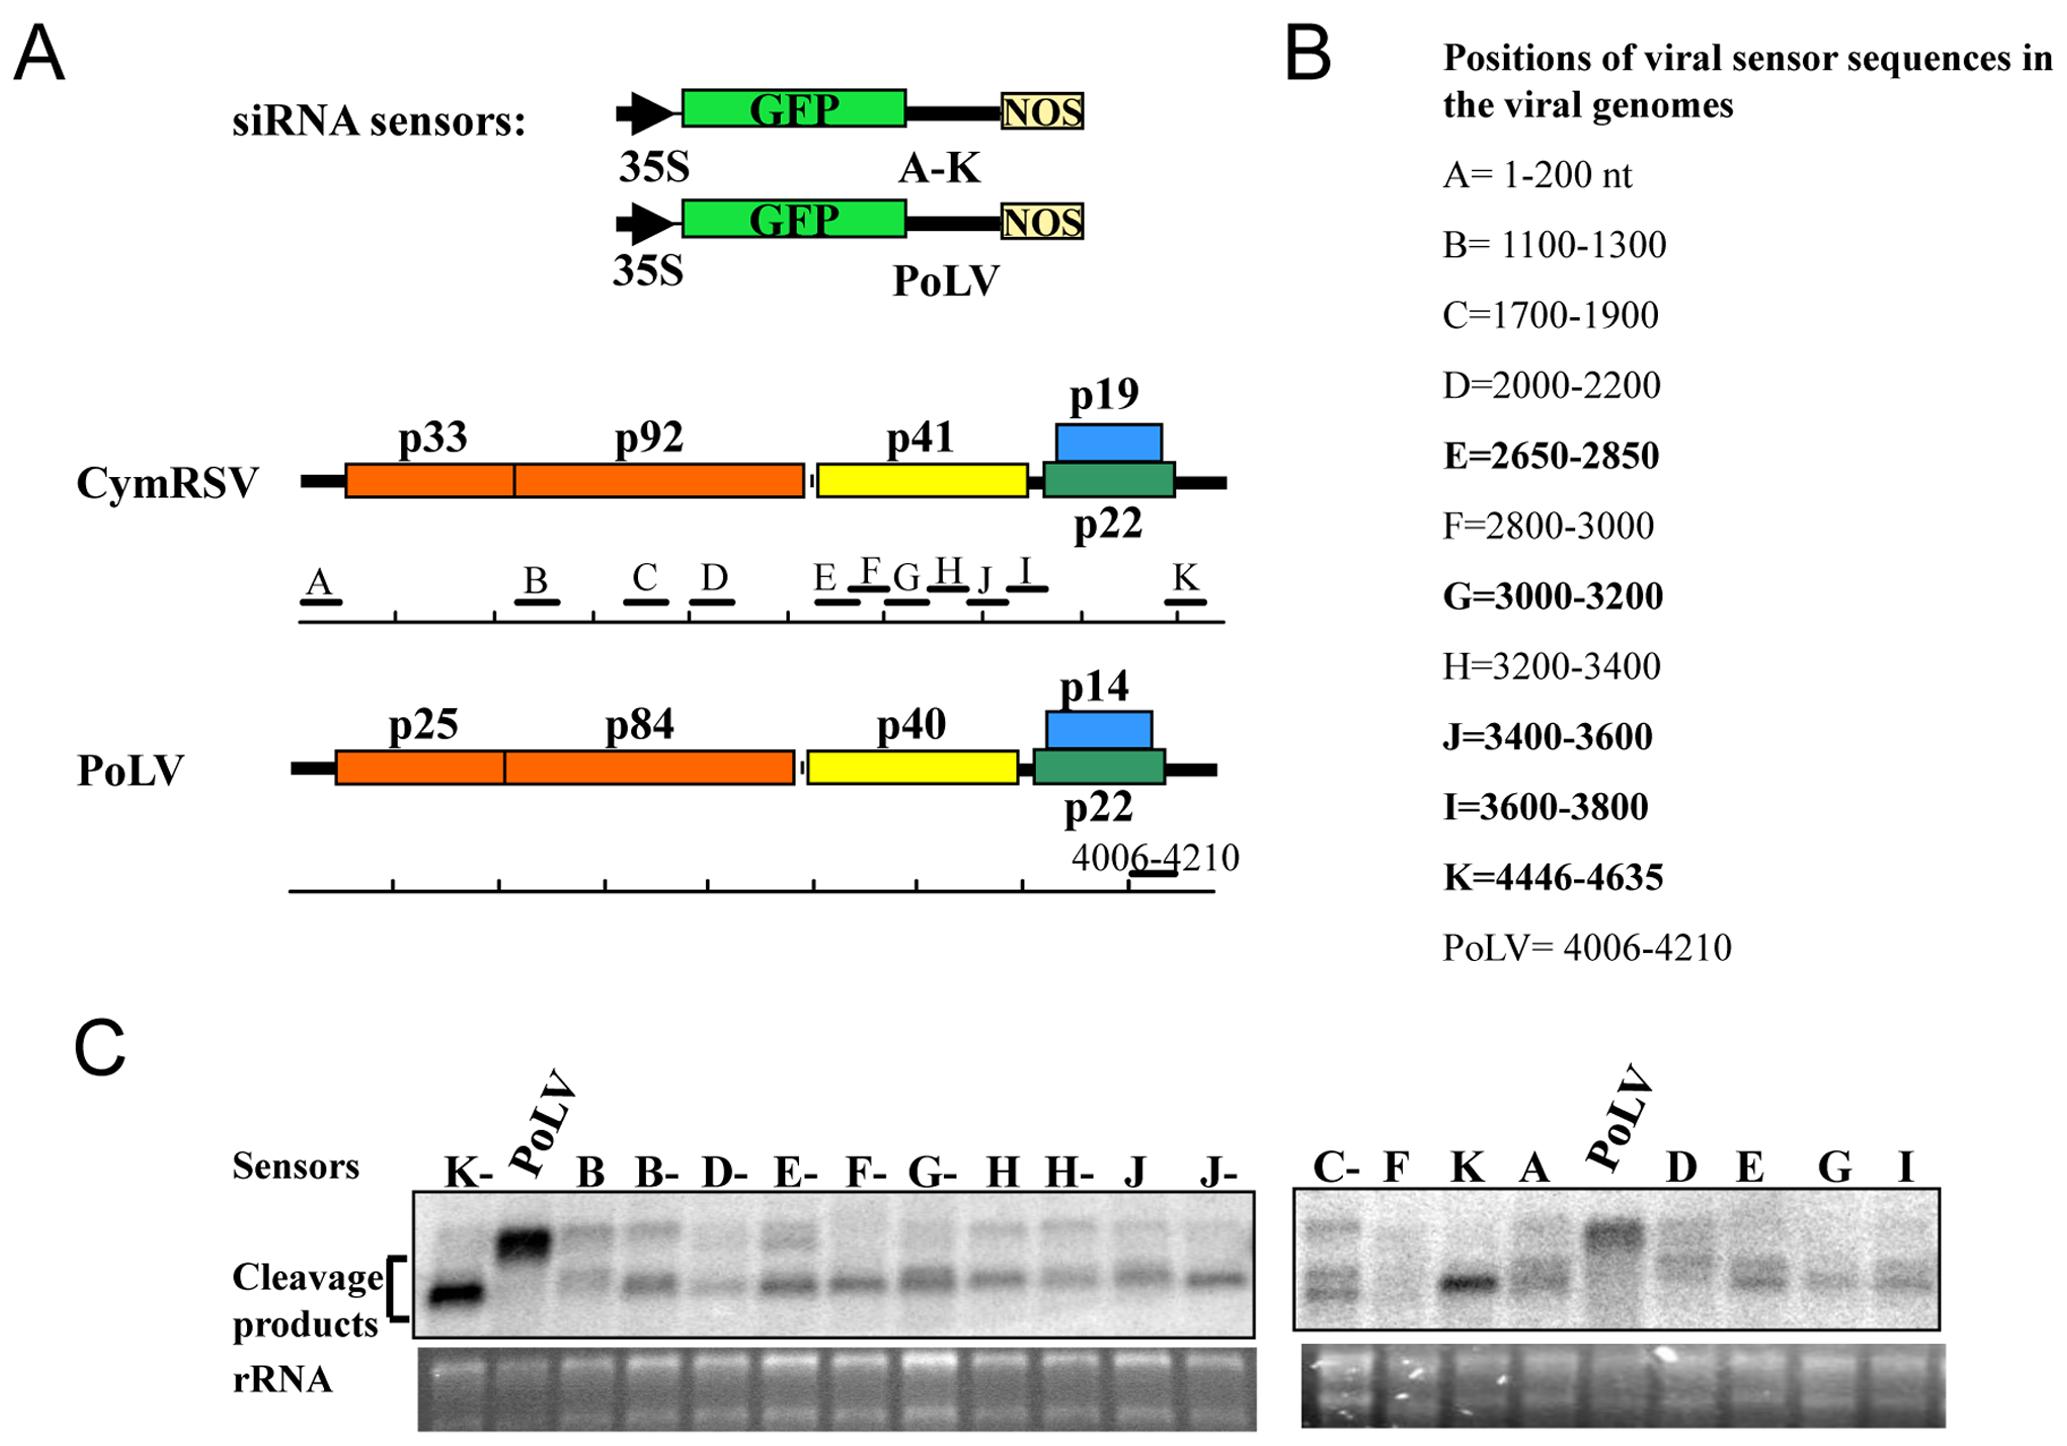 Functional analysis of vsiRNAs <i>in planta</i>.